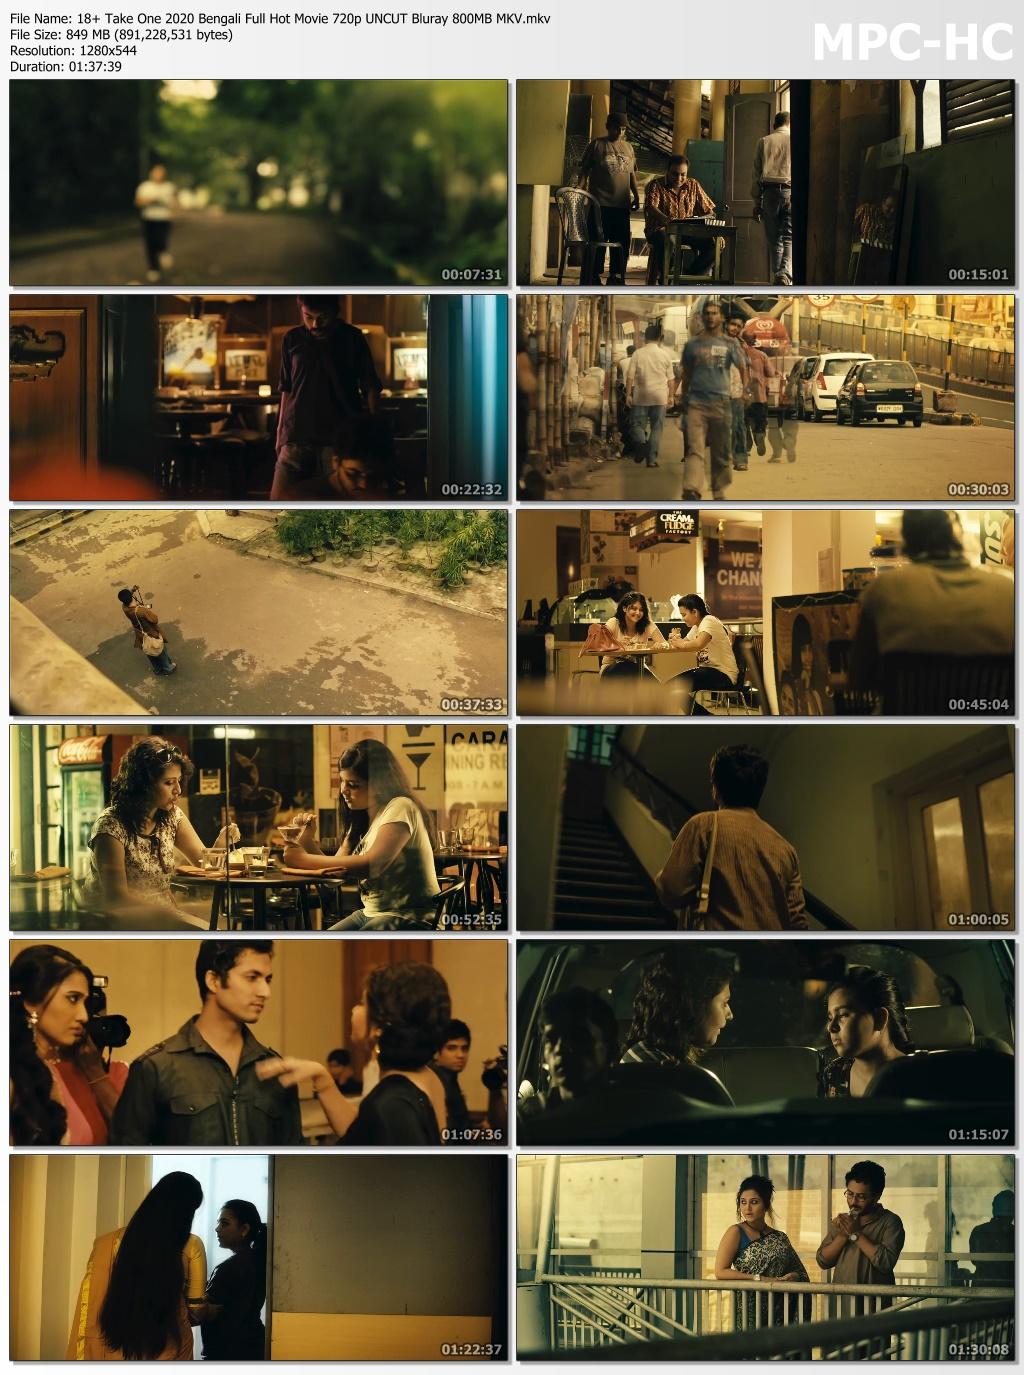 18-Take-One-2020-Bengali-Full-Hot-Movie-720p-UNCUT-Bluray-800-MB-MKV-mkv-thumbs